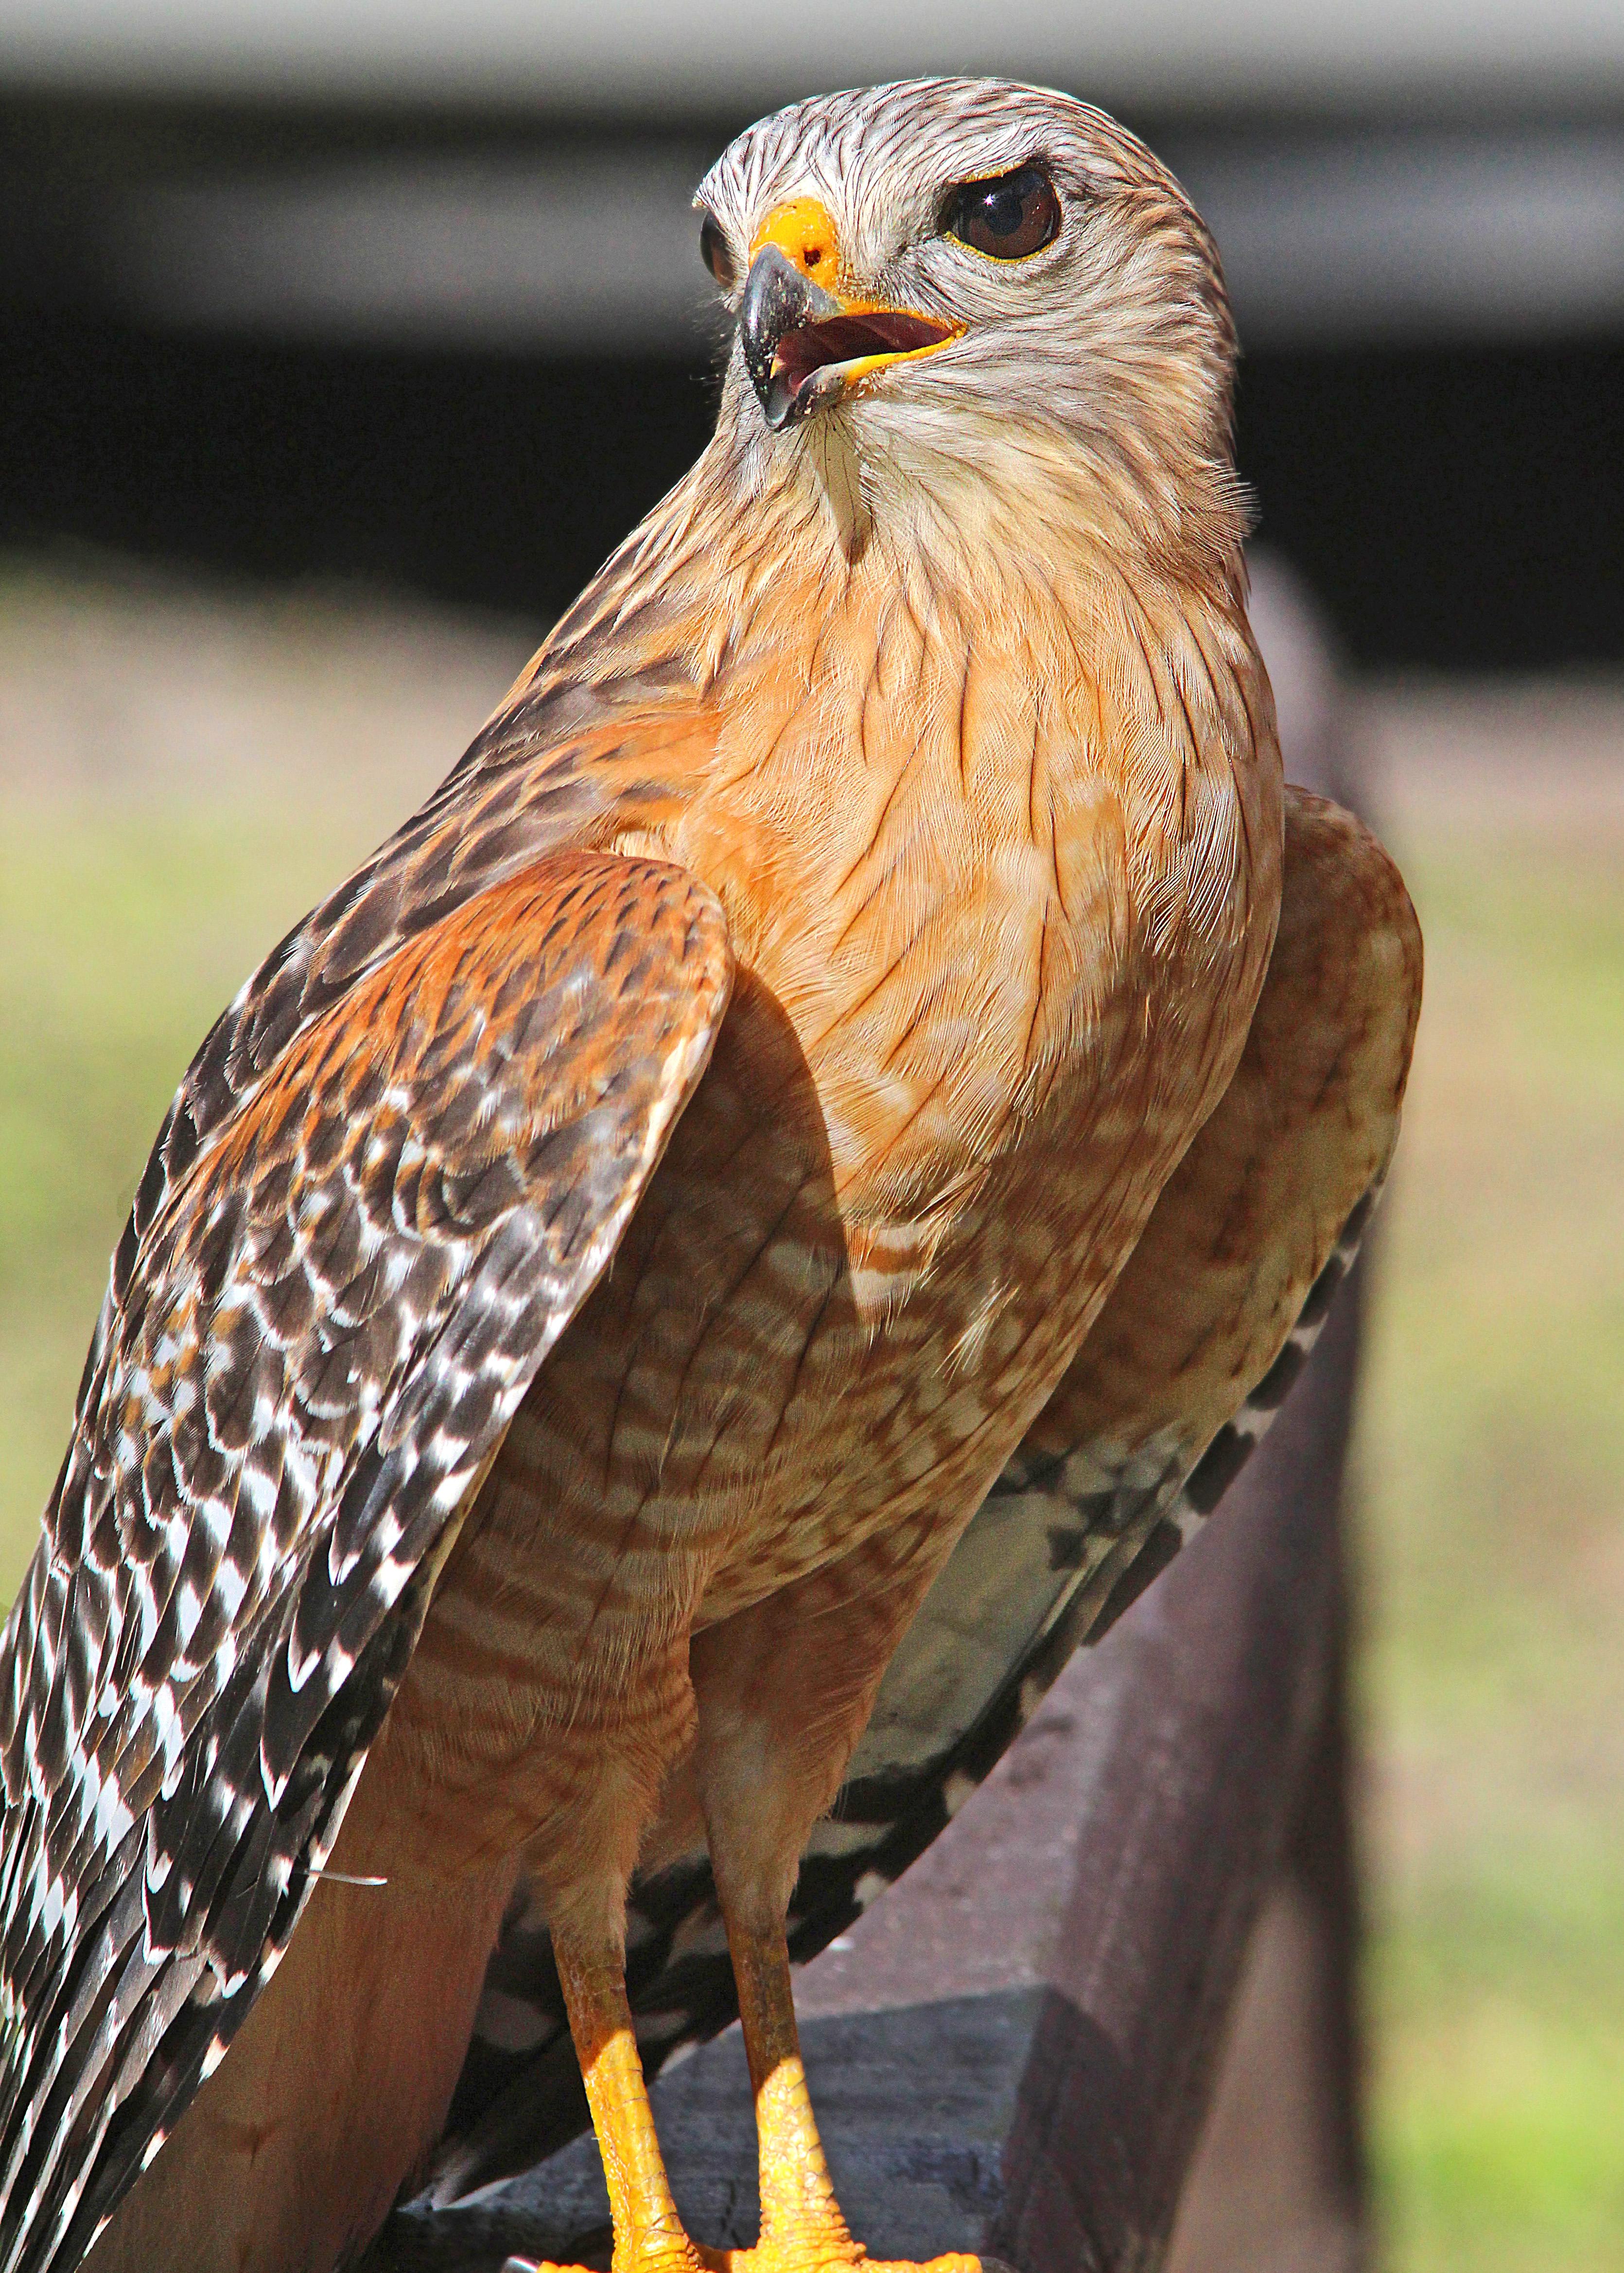 223 - red-shouldered hawk (2-22-13) highlands hammock state park, okeechobee co, fl (6) photo